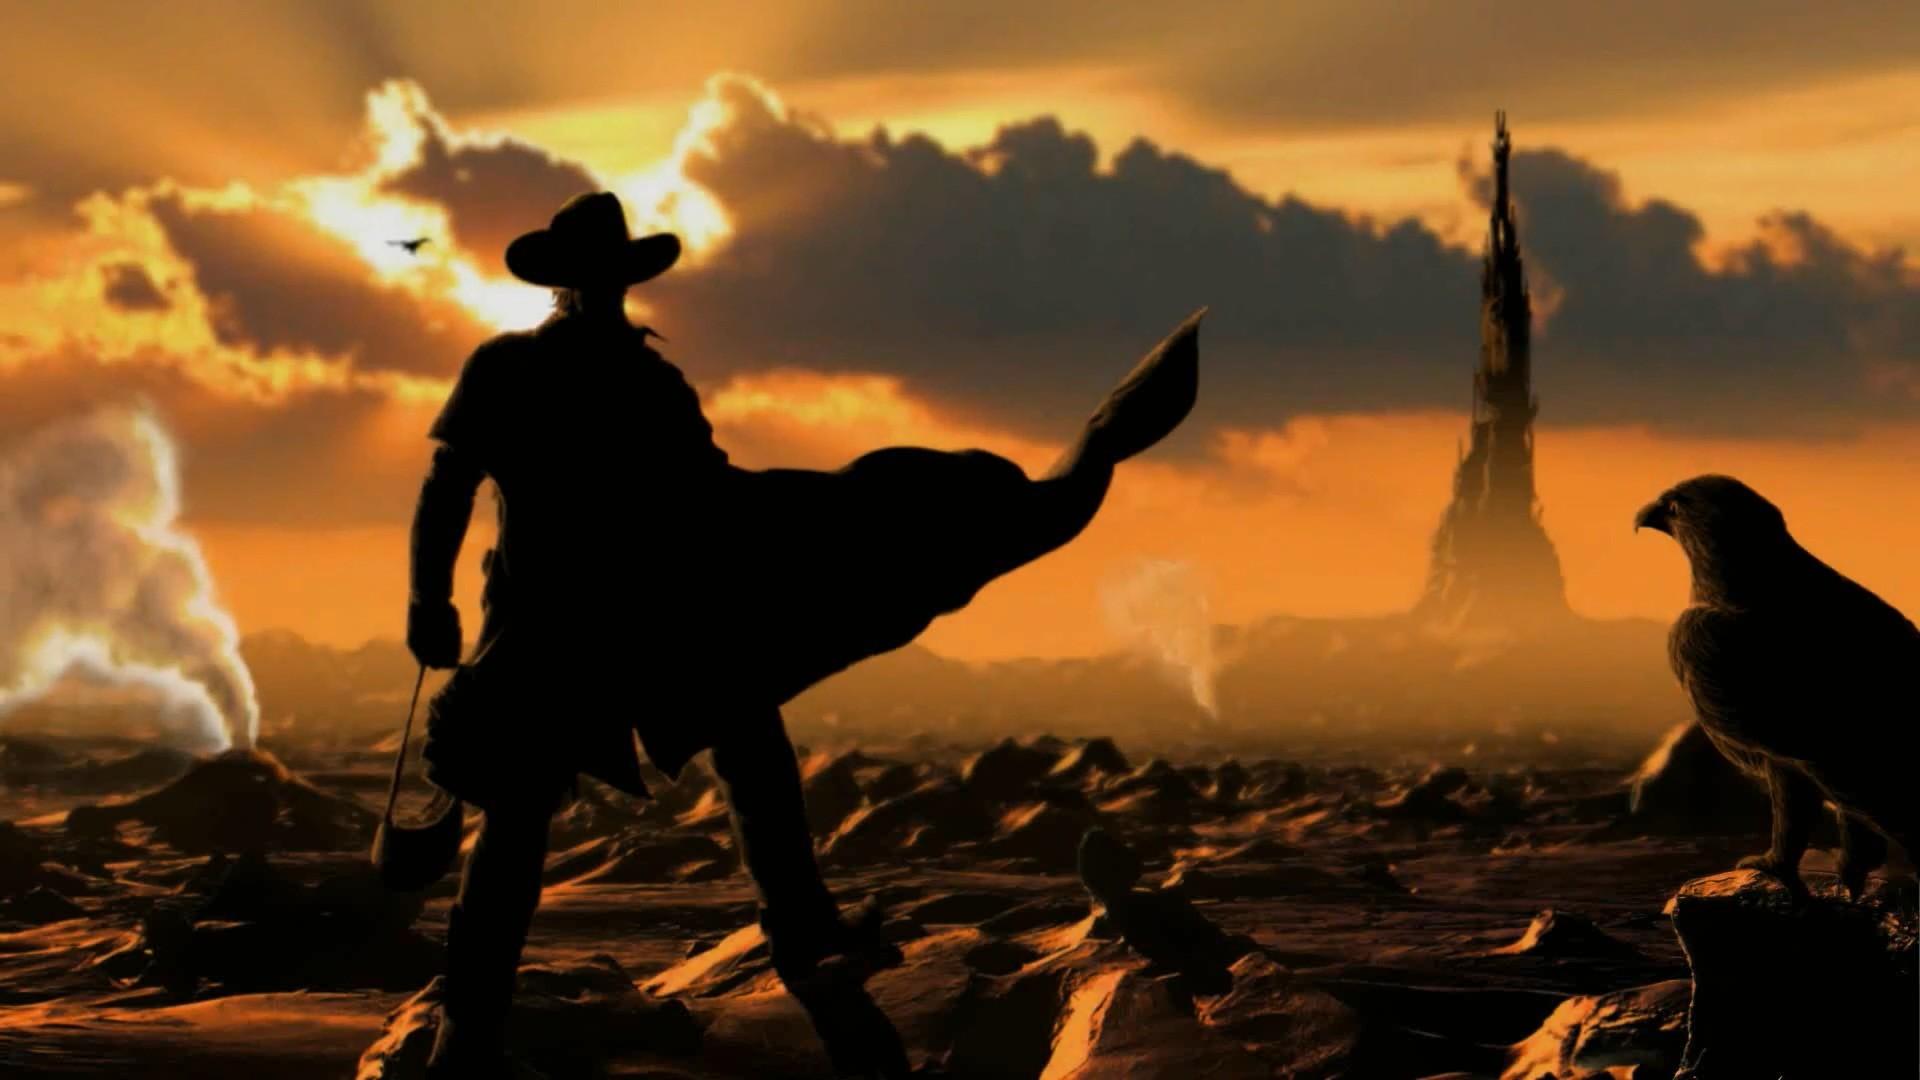 Western cowboy wallpaper 70 images - Cowboy wallpaper hd ...